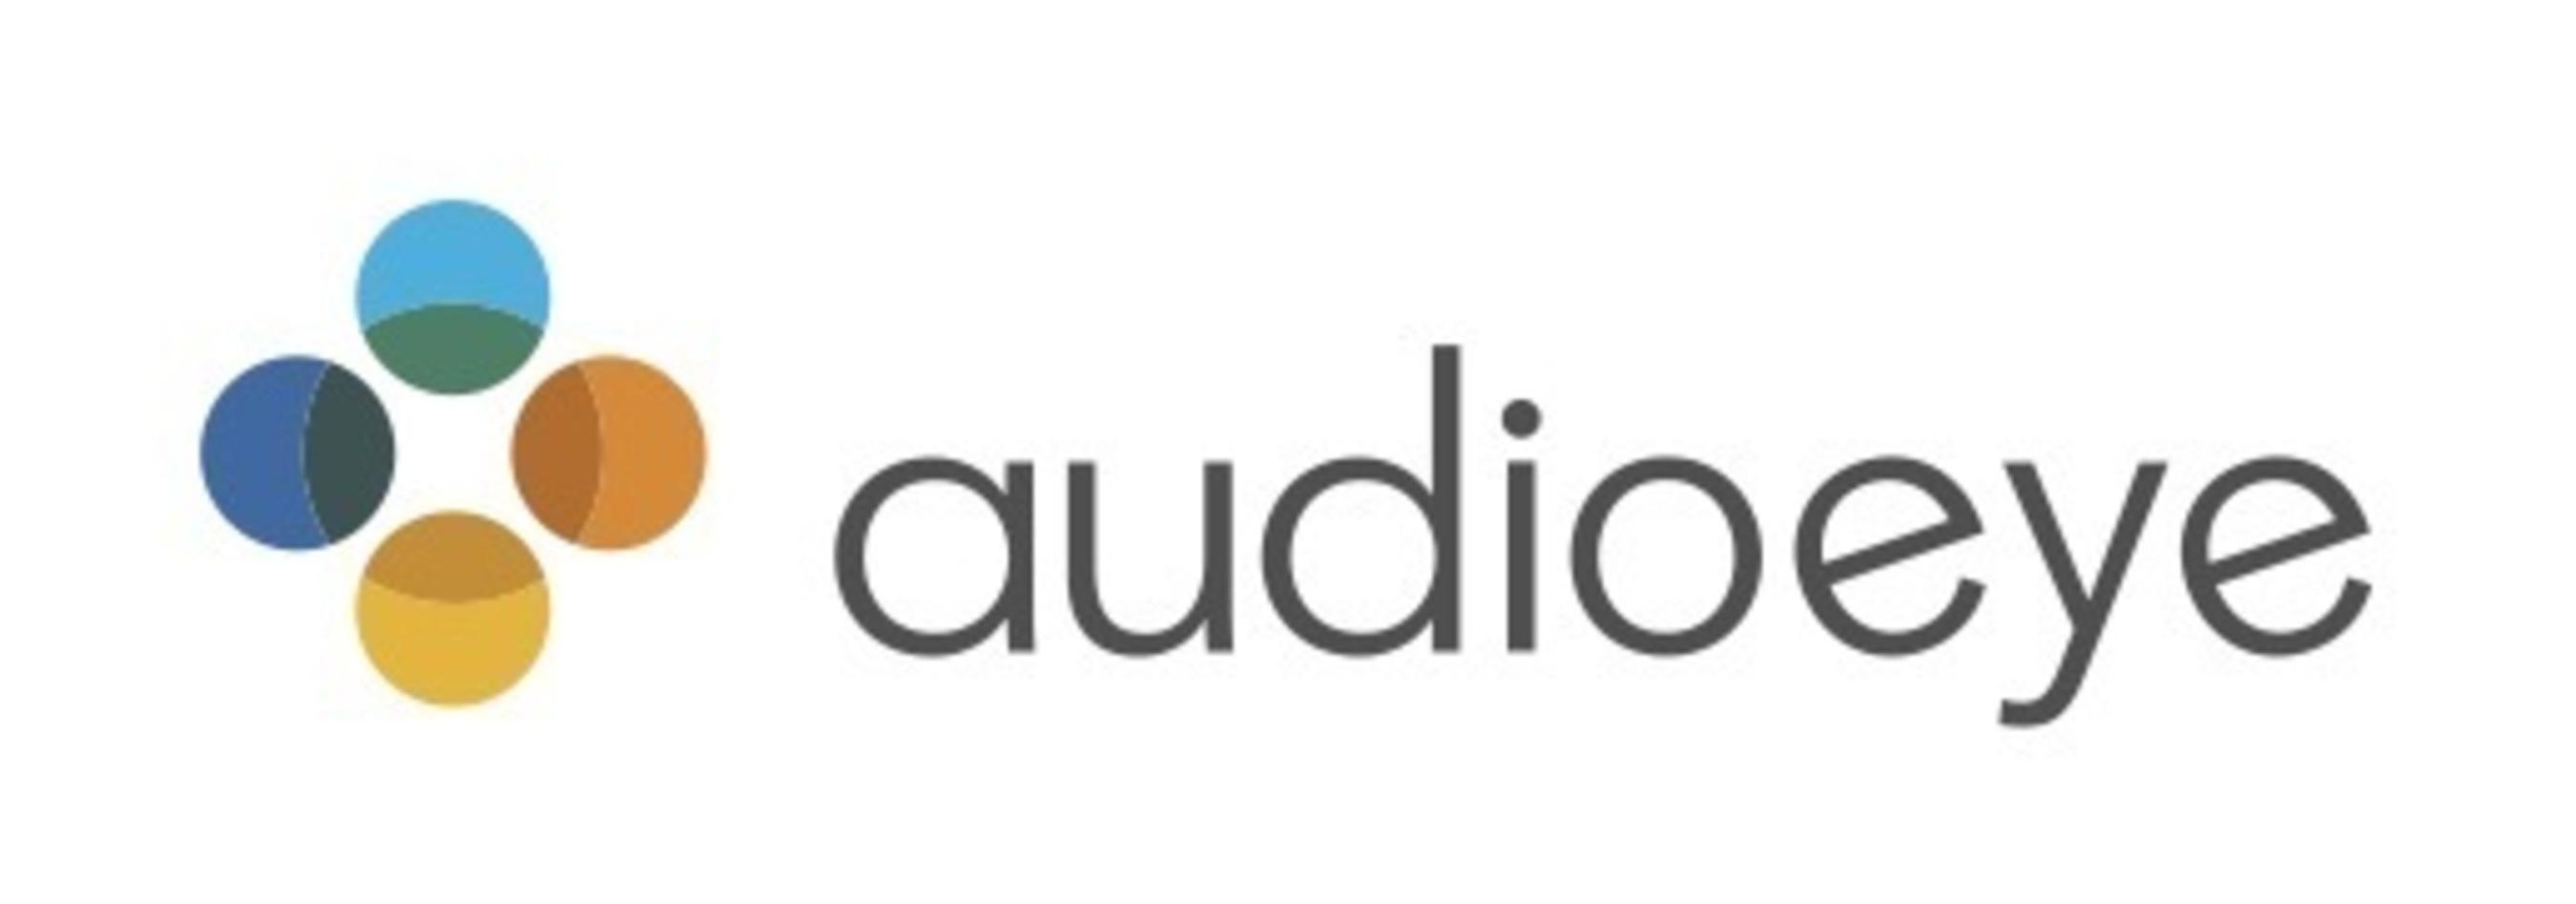 AudioEye, Inc. Logo